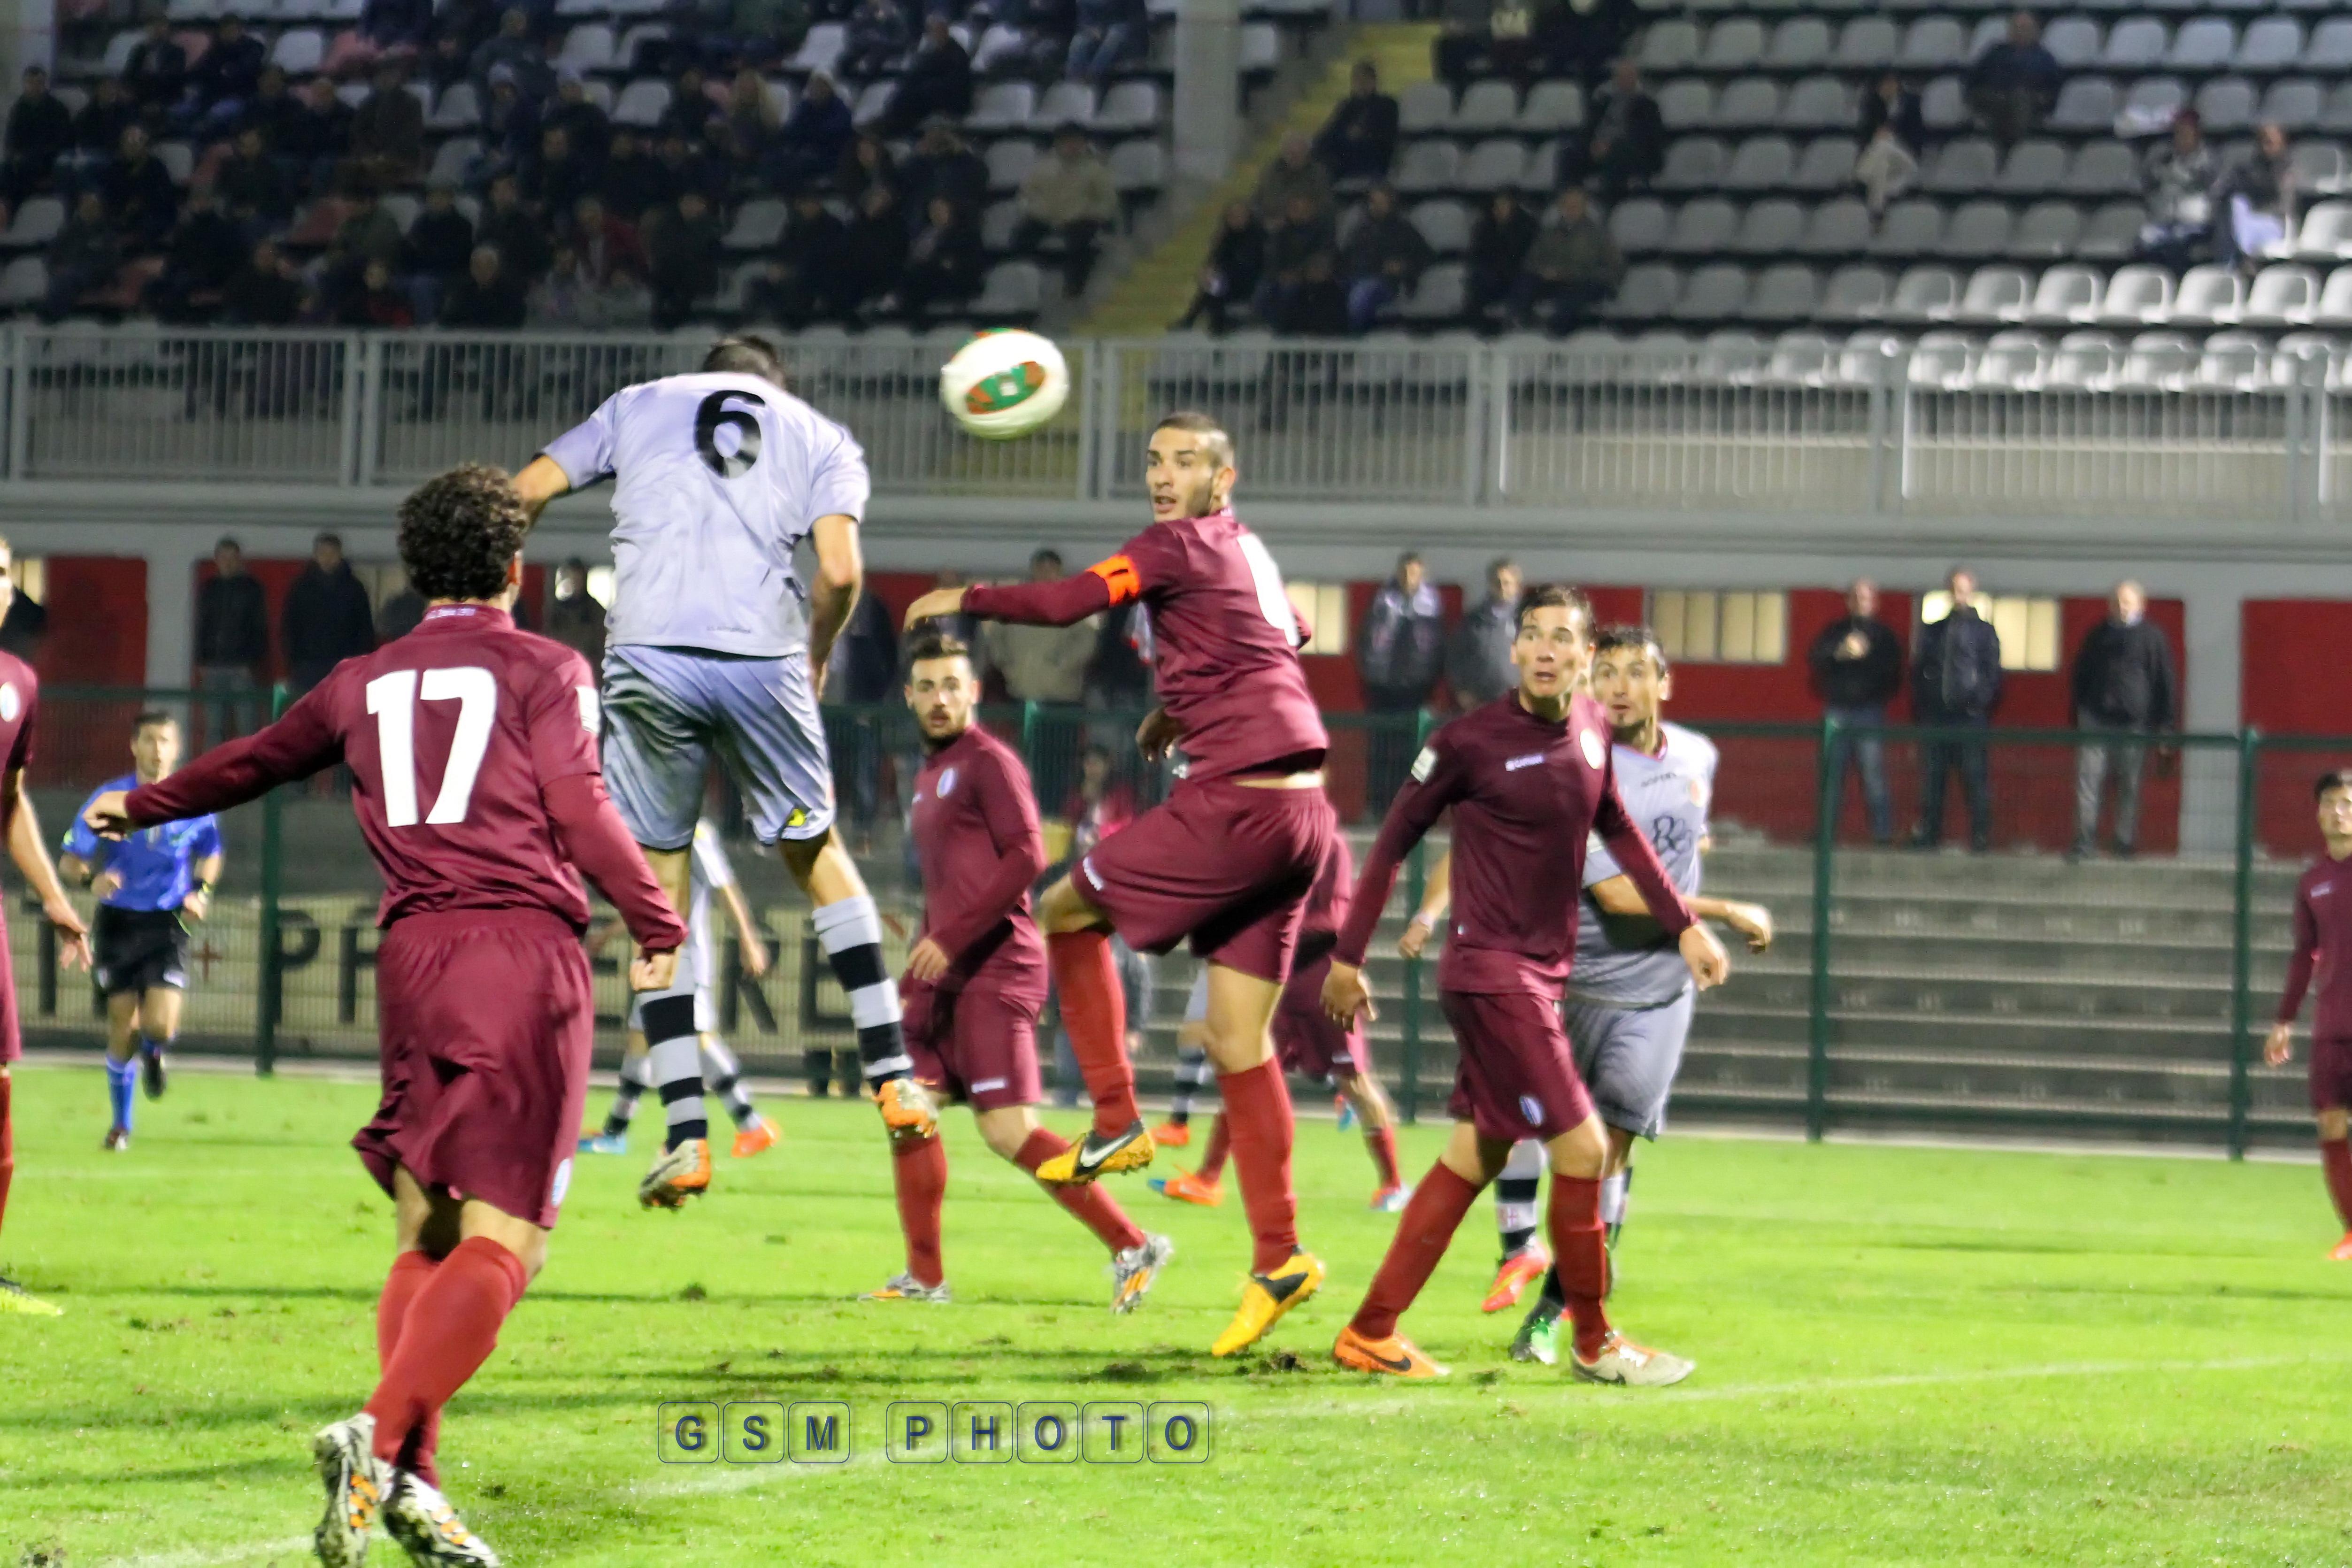 Alessandria-Pavia Coppa Italia_29_10_2014 (9)